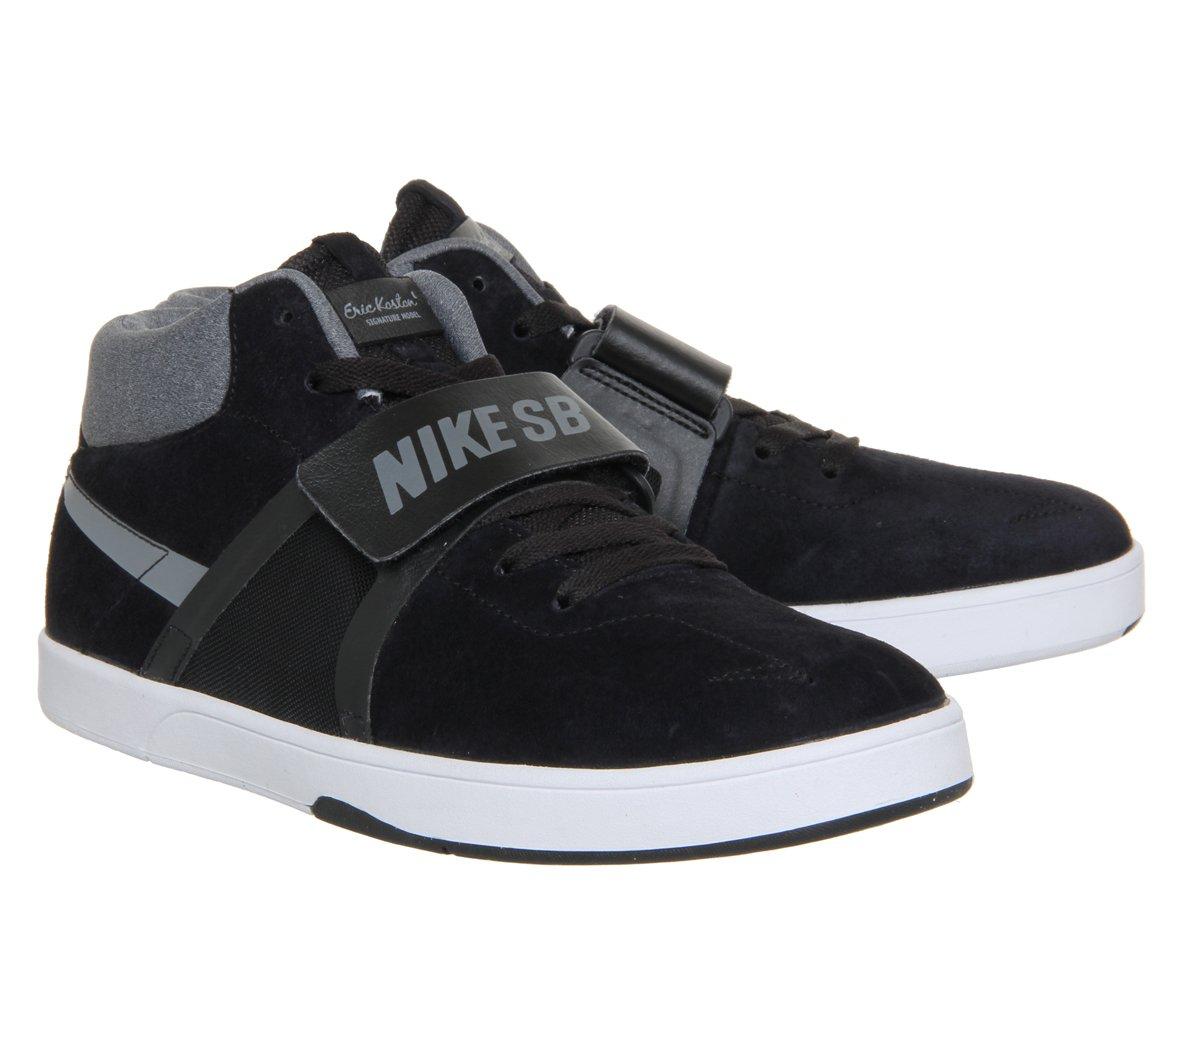 Nike Sb Eric Koston Mid Prem in Black for Men - Lyst